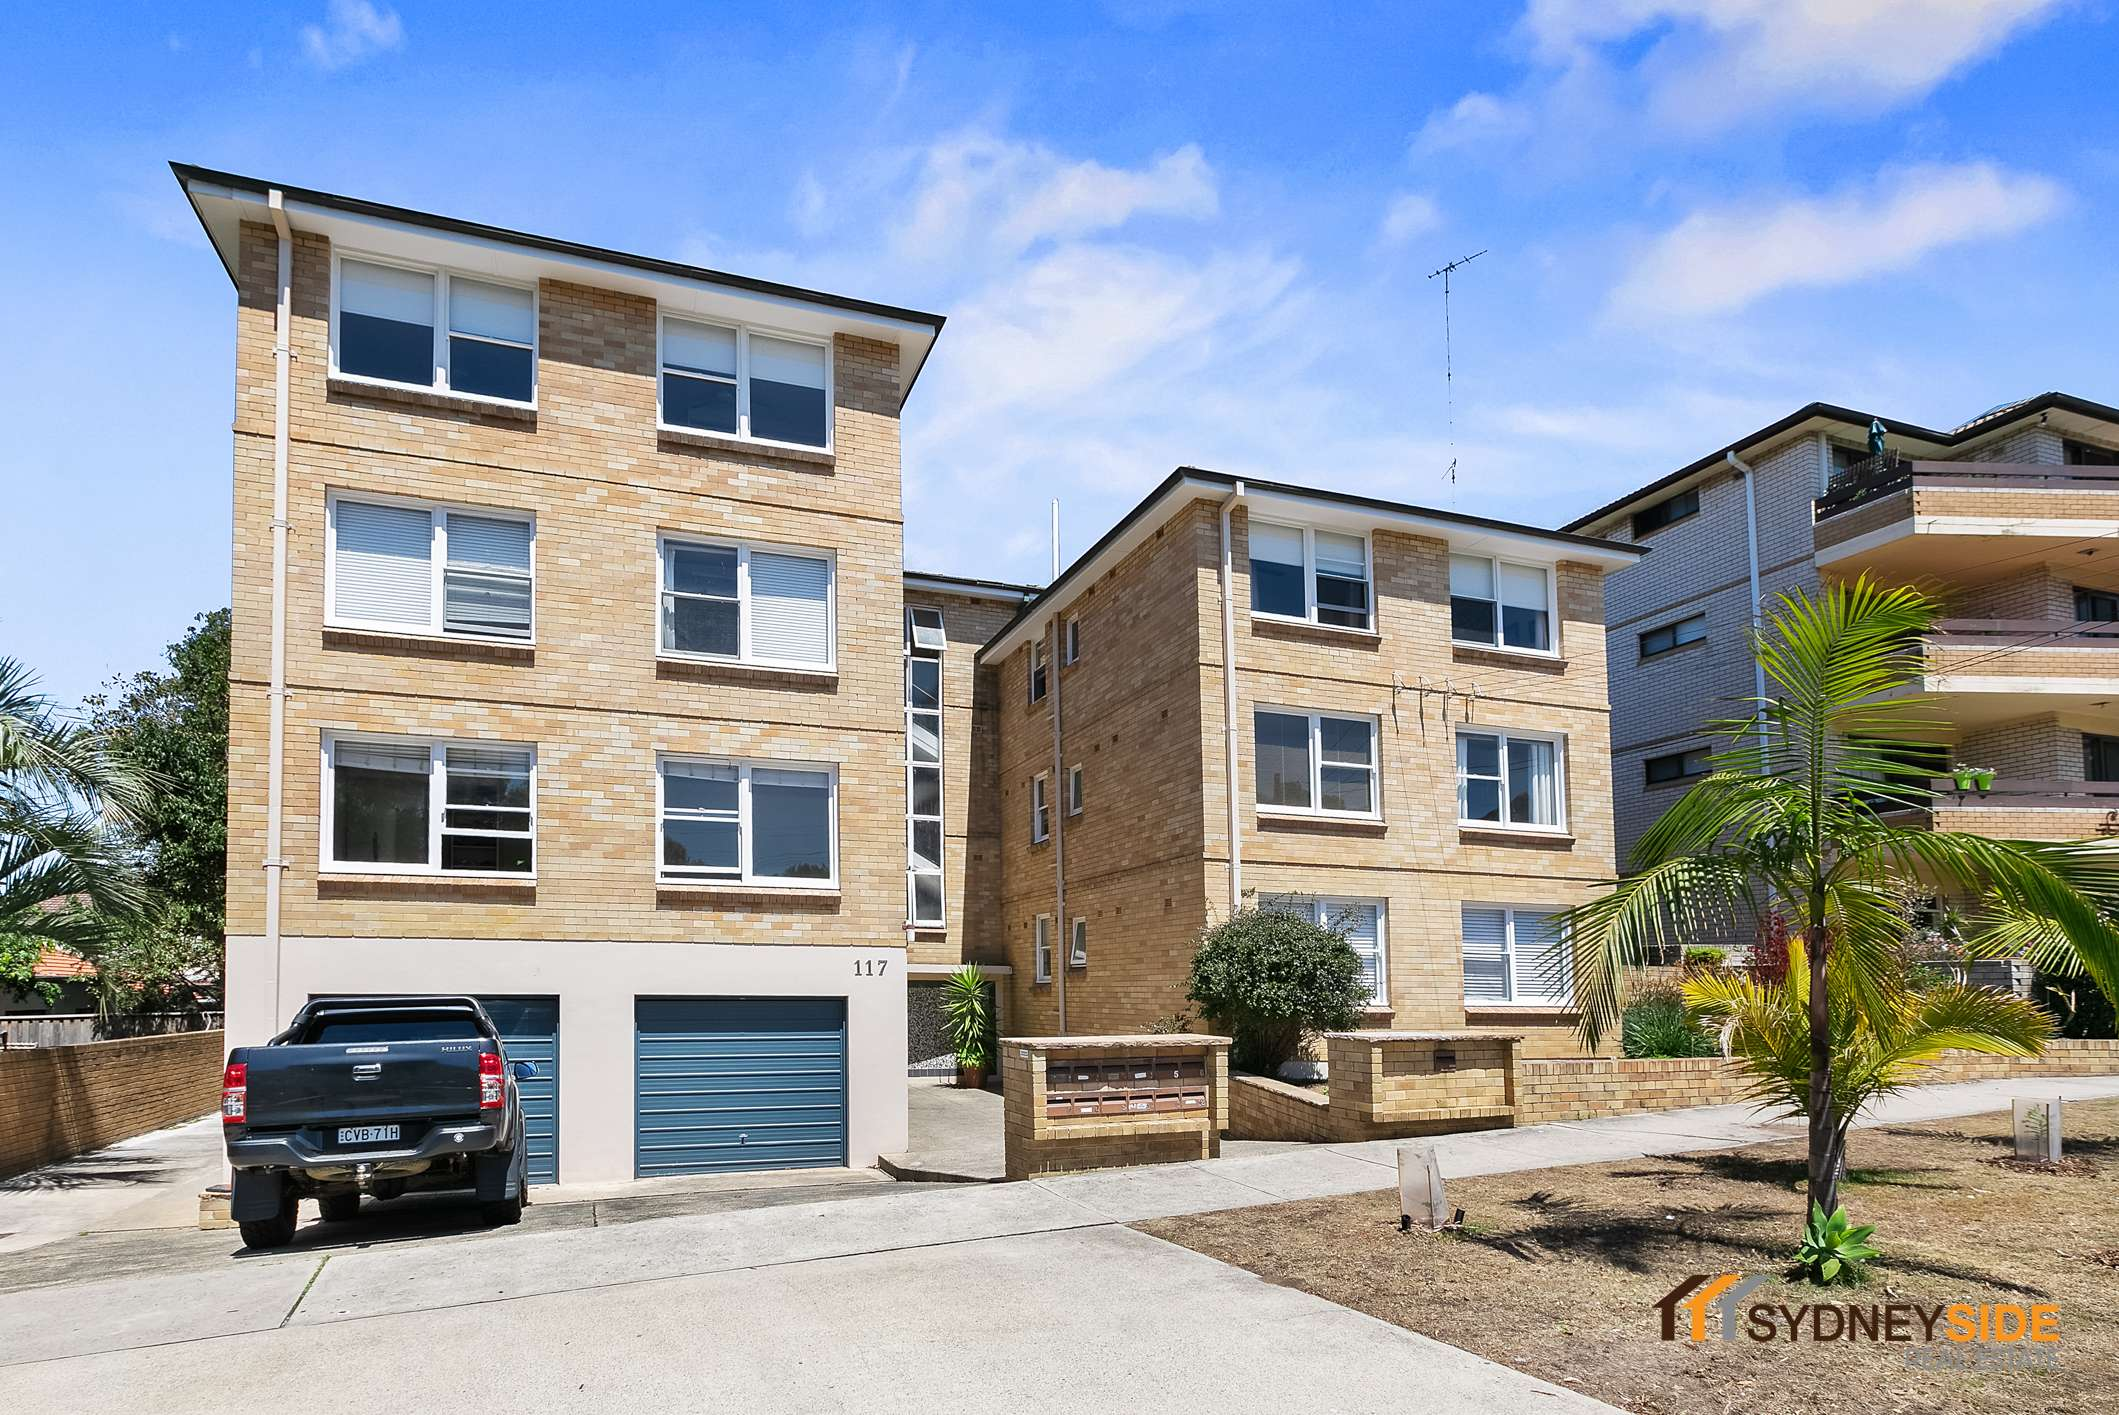 4/113-117 Duncan St, Maroubra NSW 2035